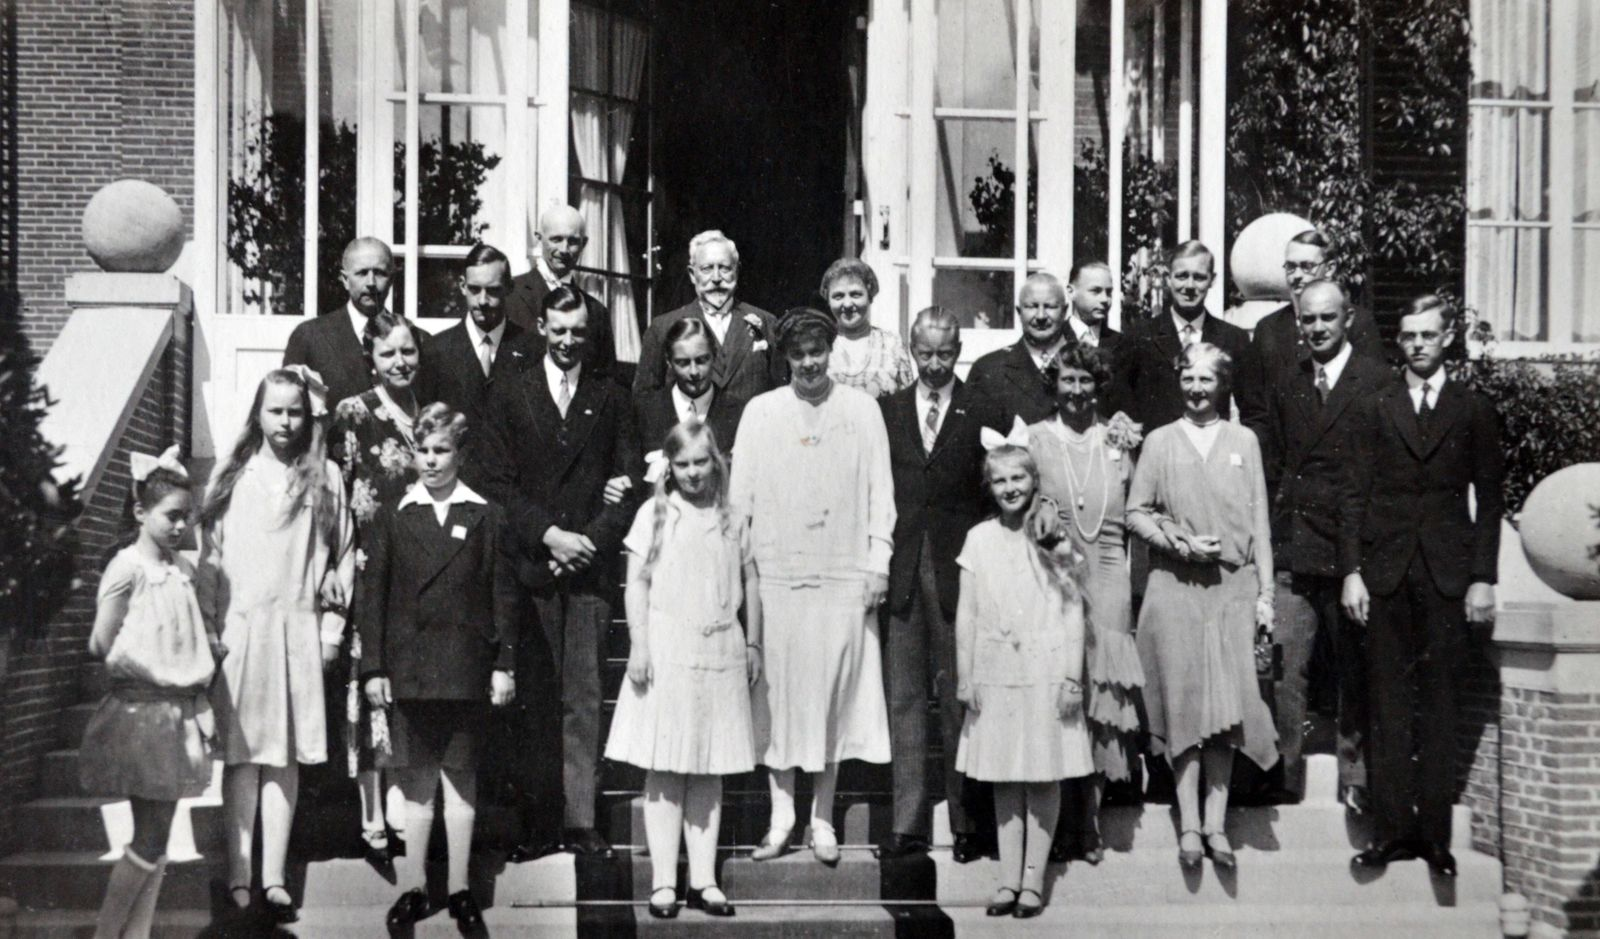 The exiled German royal family at Doorn Netherlands 1924 The exiled German royal family at Doorn N